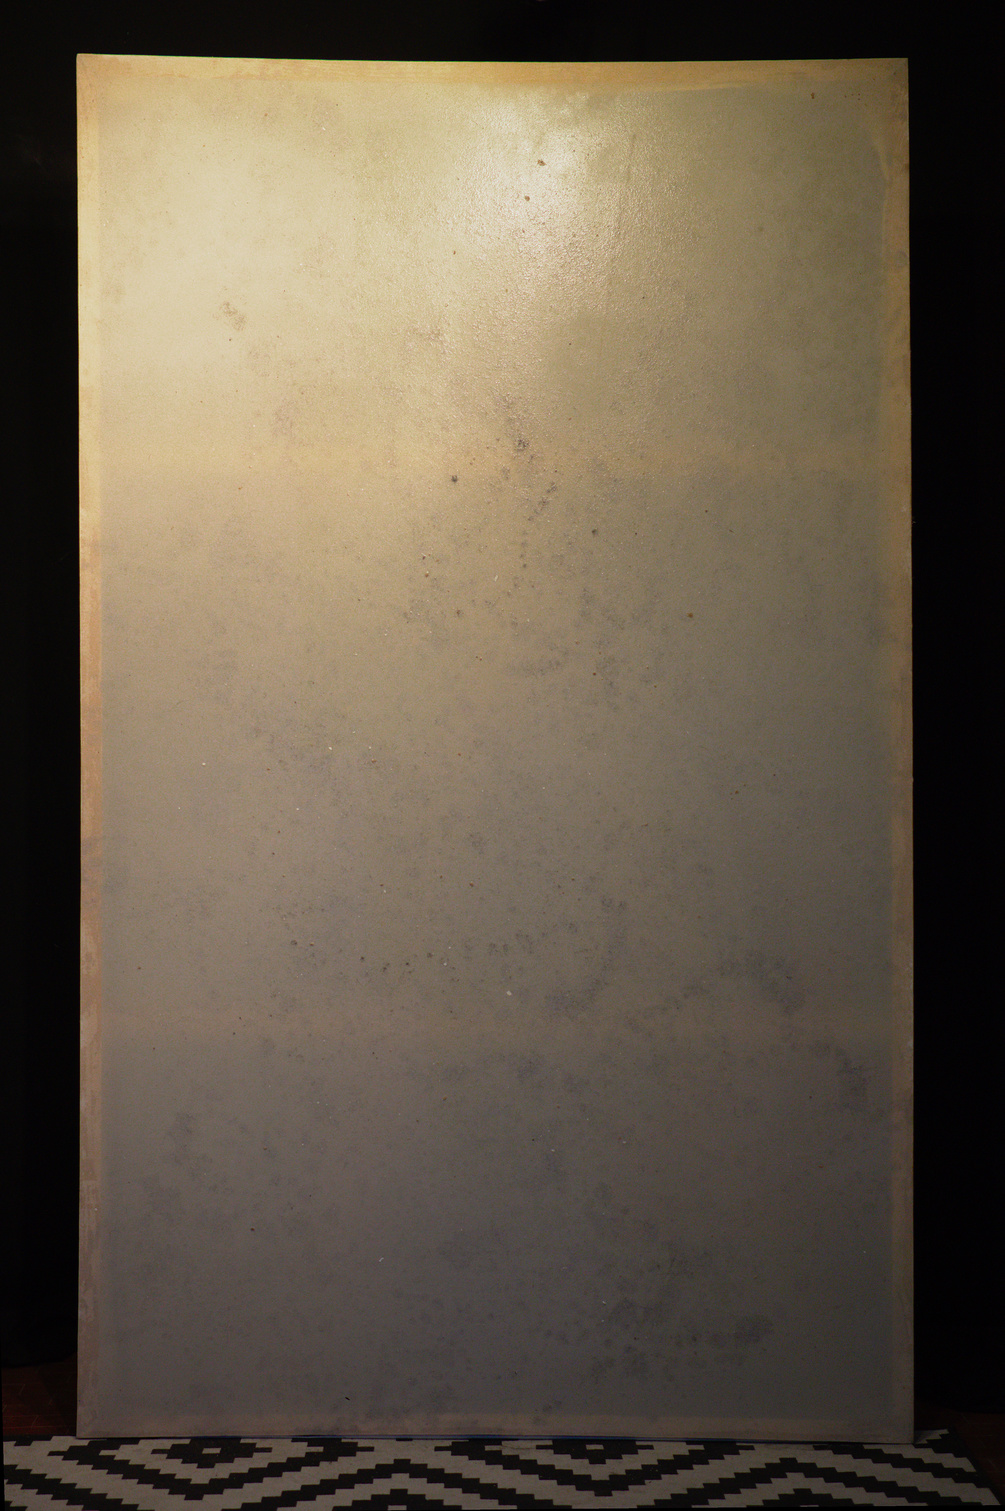 IlGattaRossa - 21 Mar 2015 - Ribalta - 01-DSC_0022